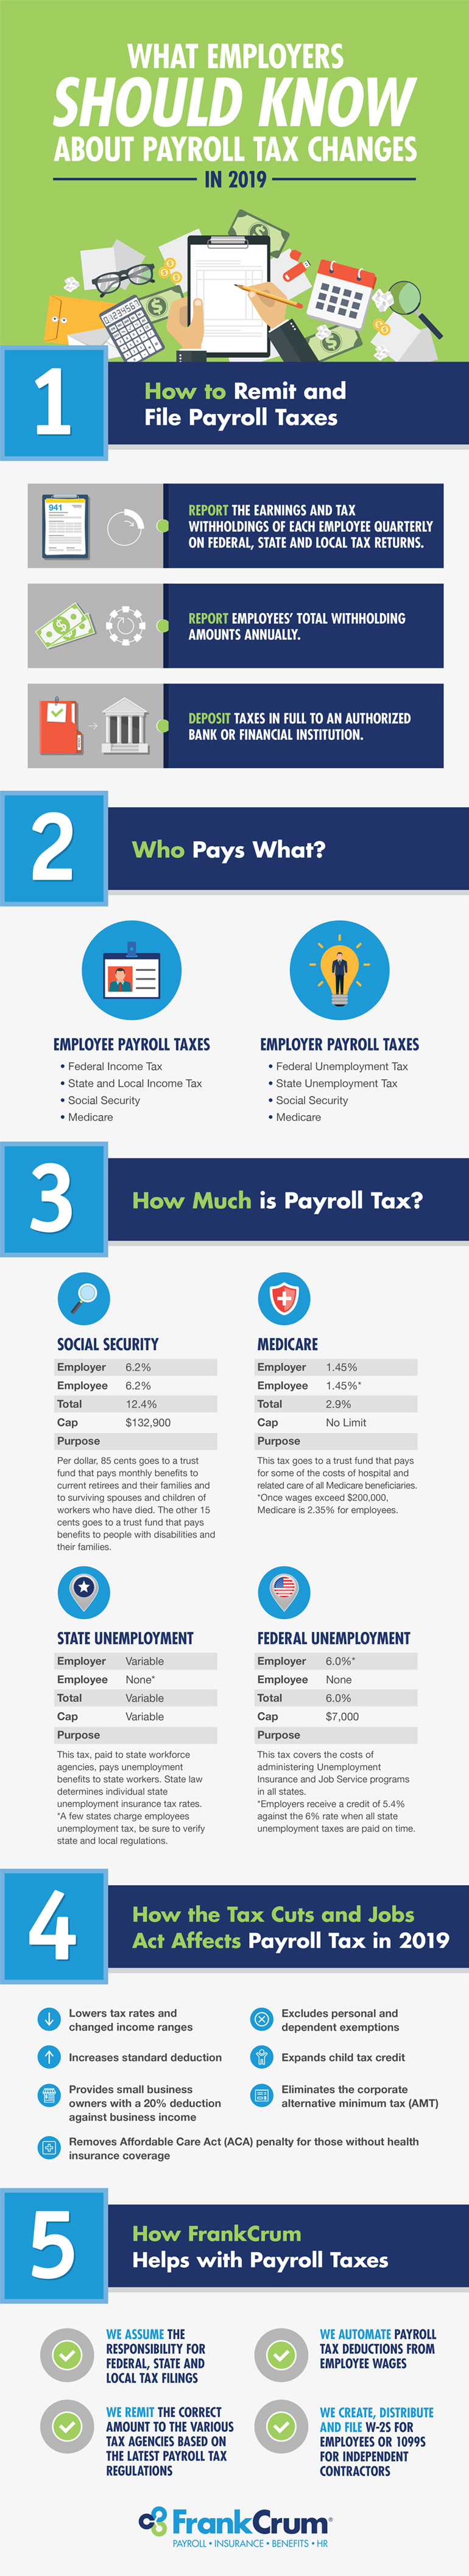 FrankCrum_Blog_Infographic_payrolltaxchanges